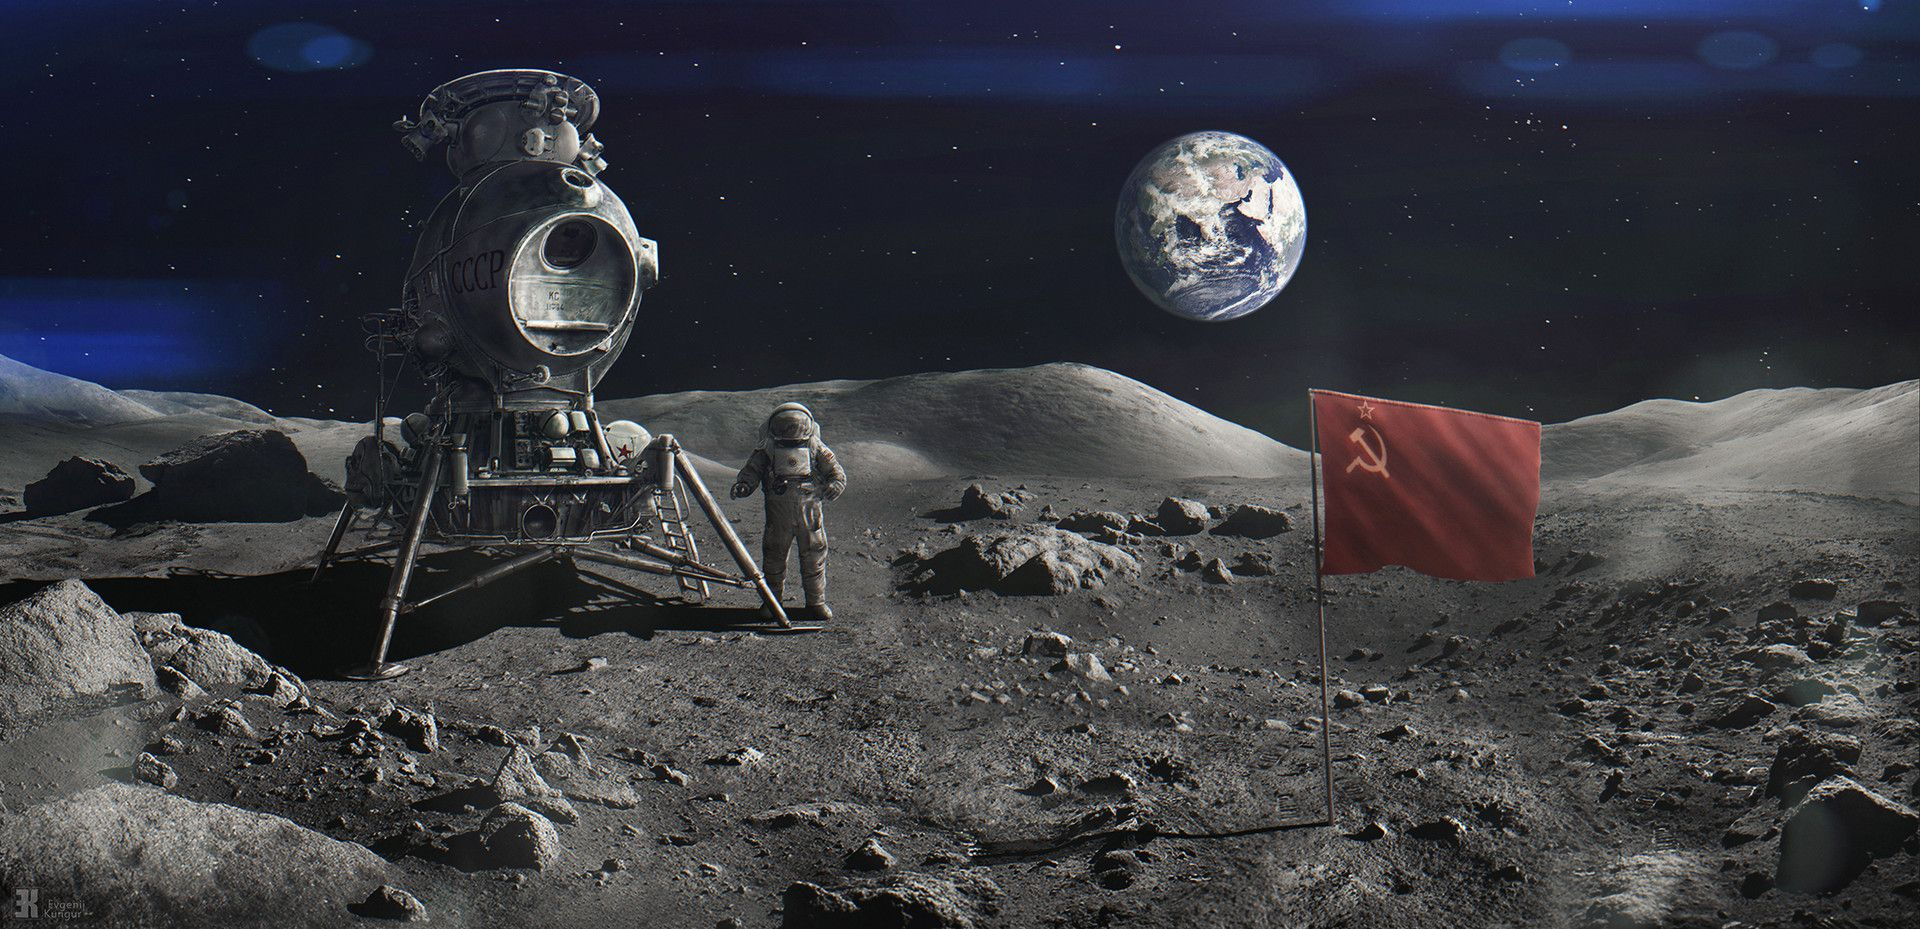 Pin On Art Sci Fi Astronaut on moon with flag wallpaper